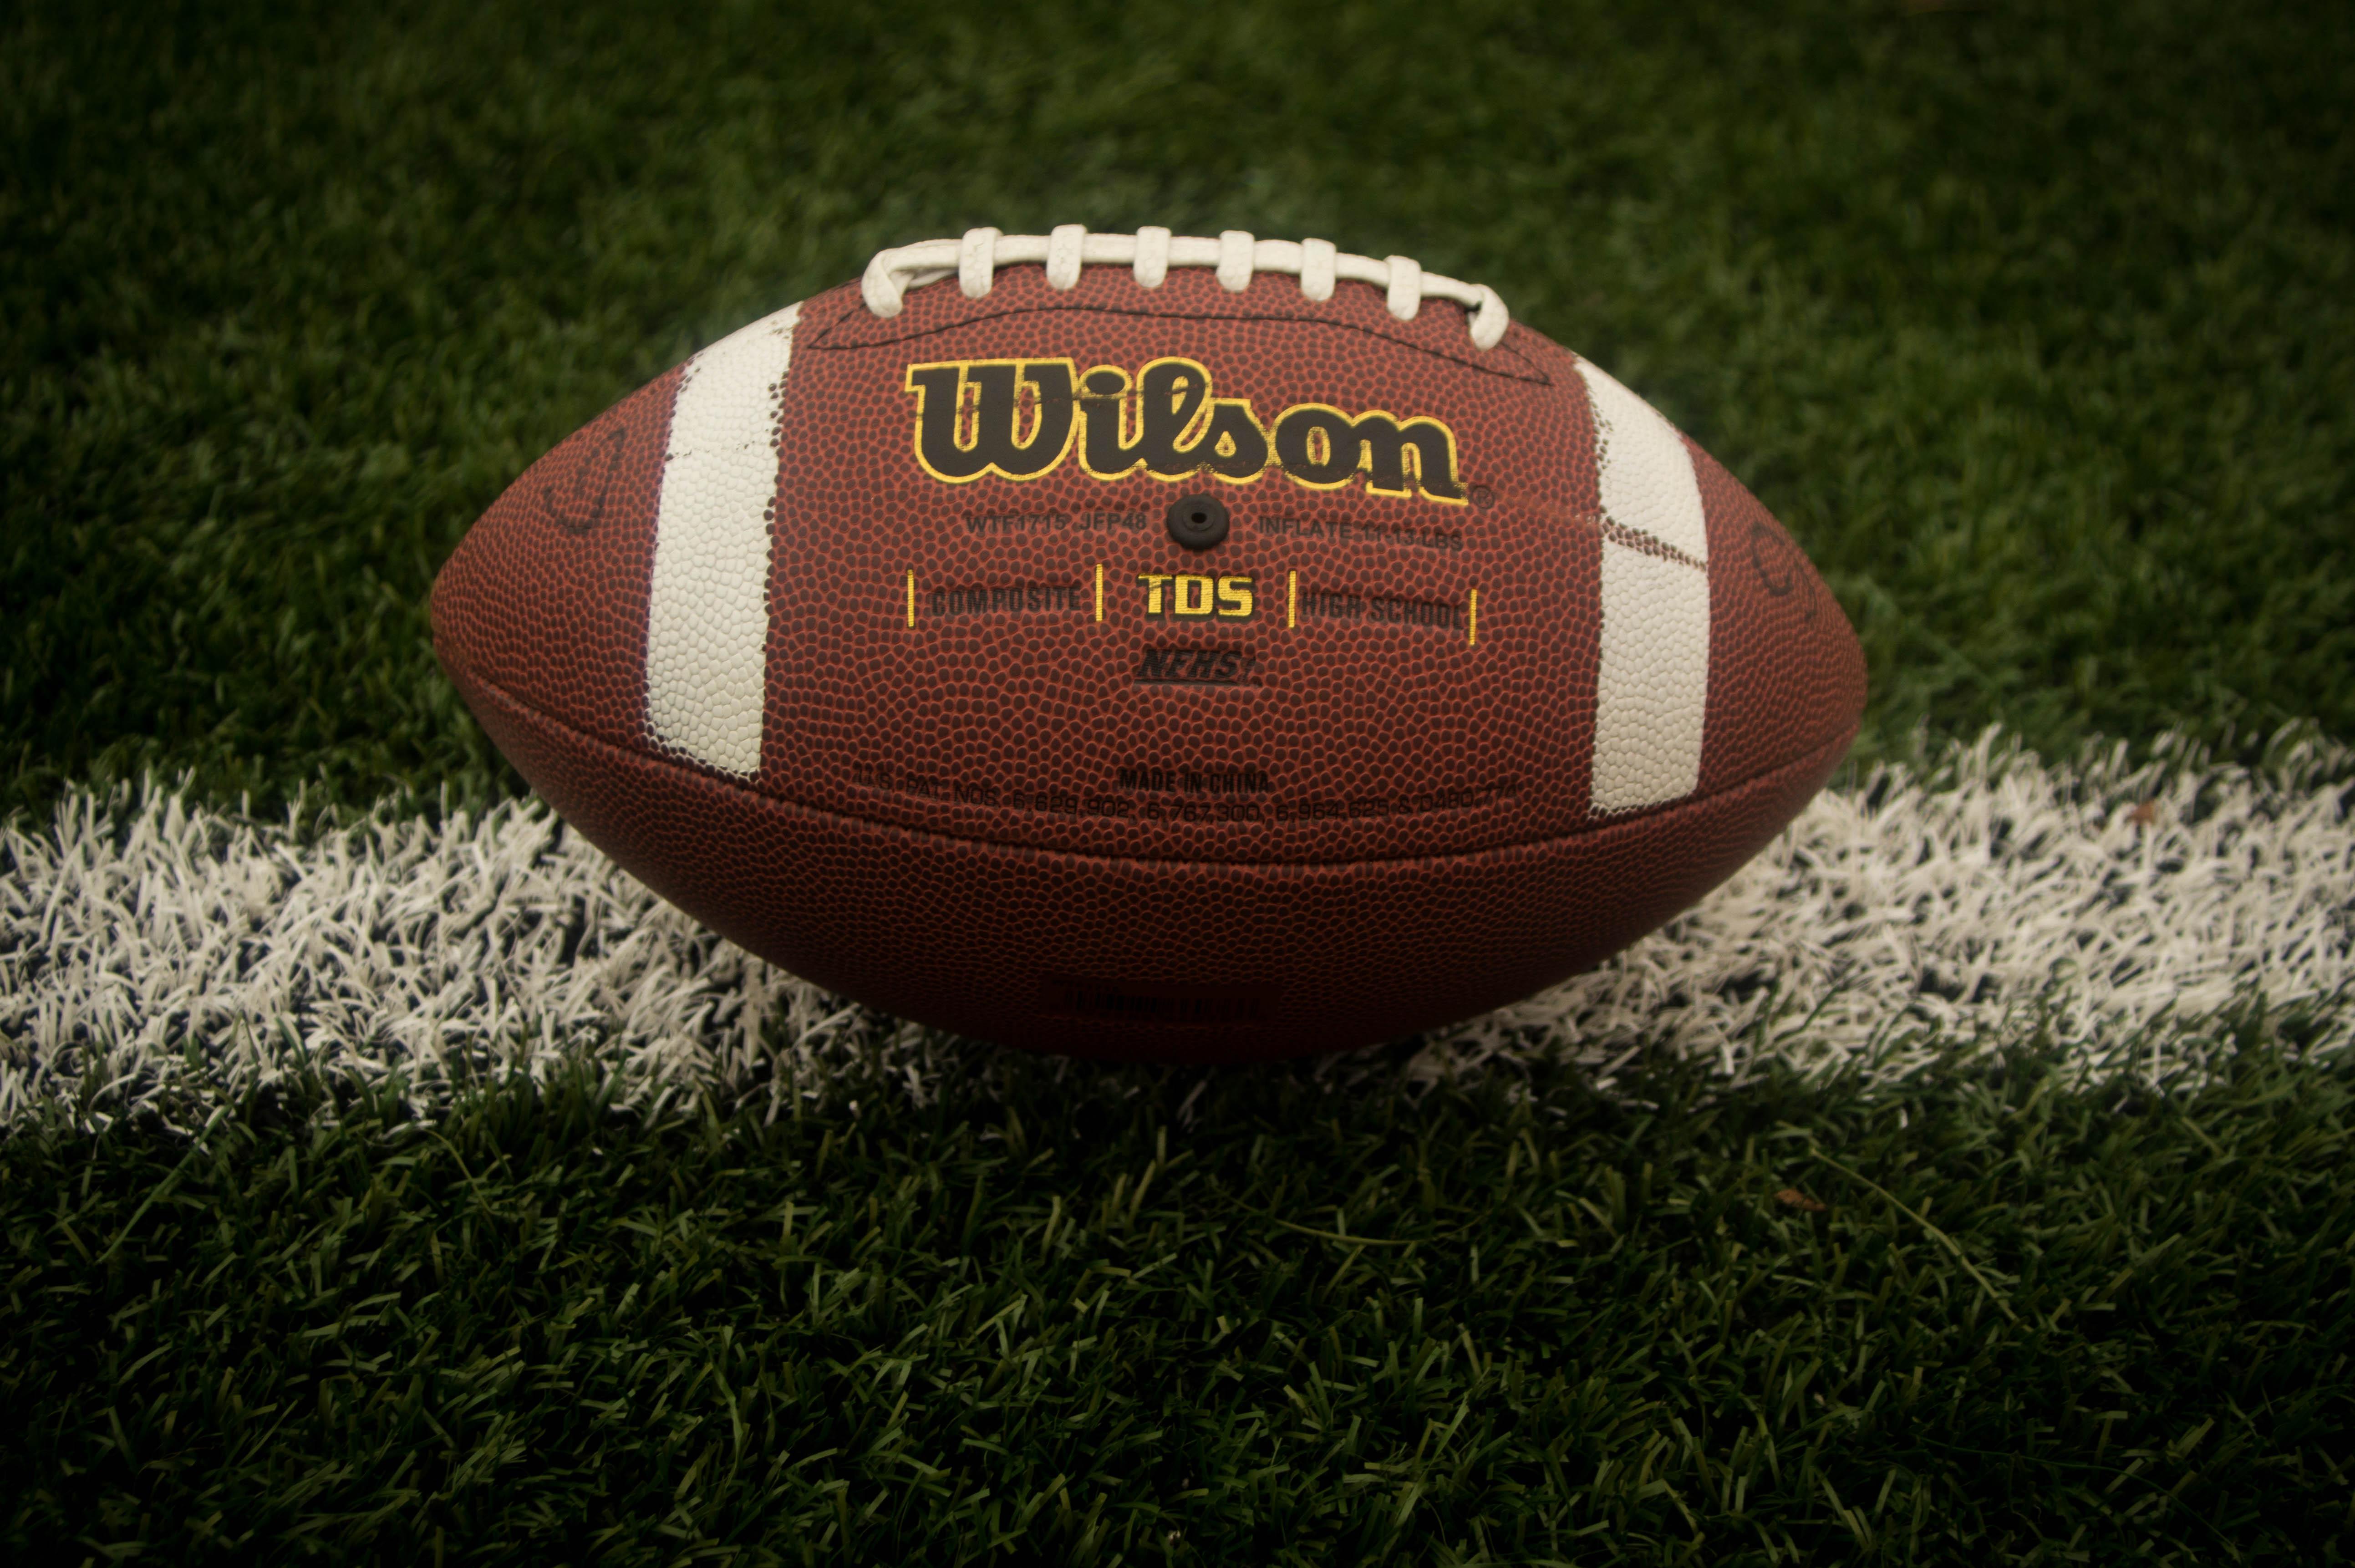 field-sport-ball-america